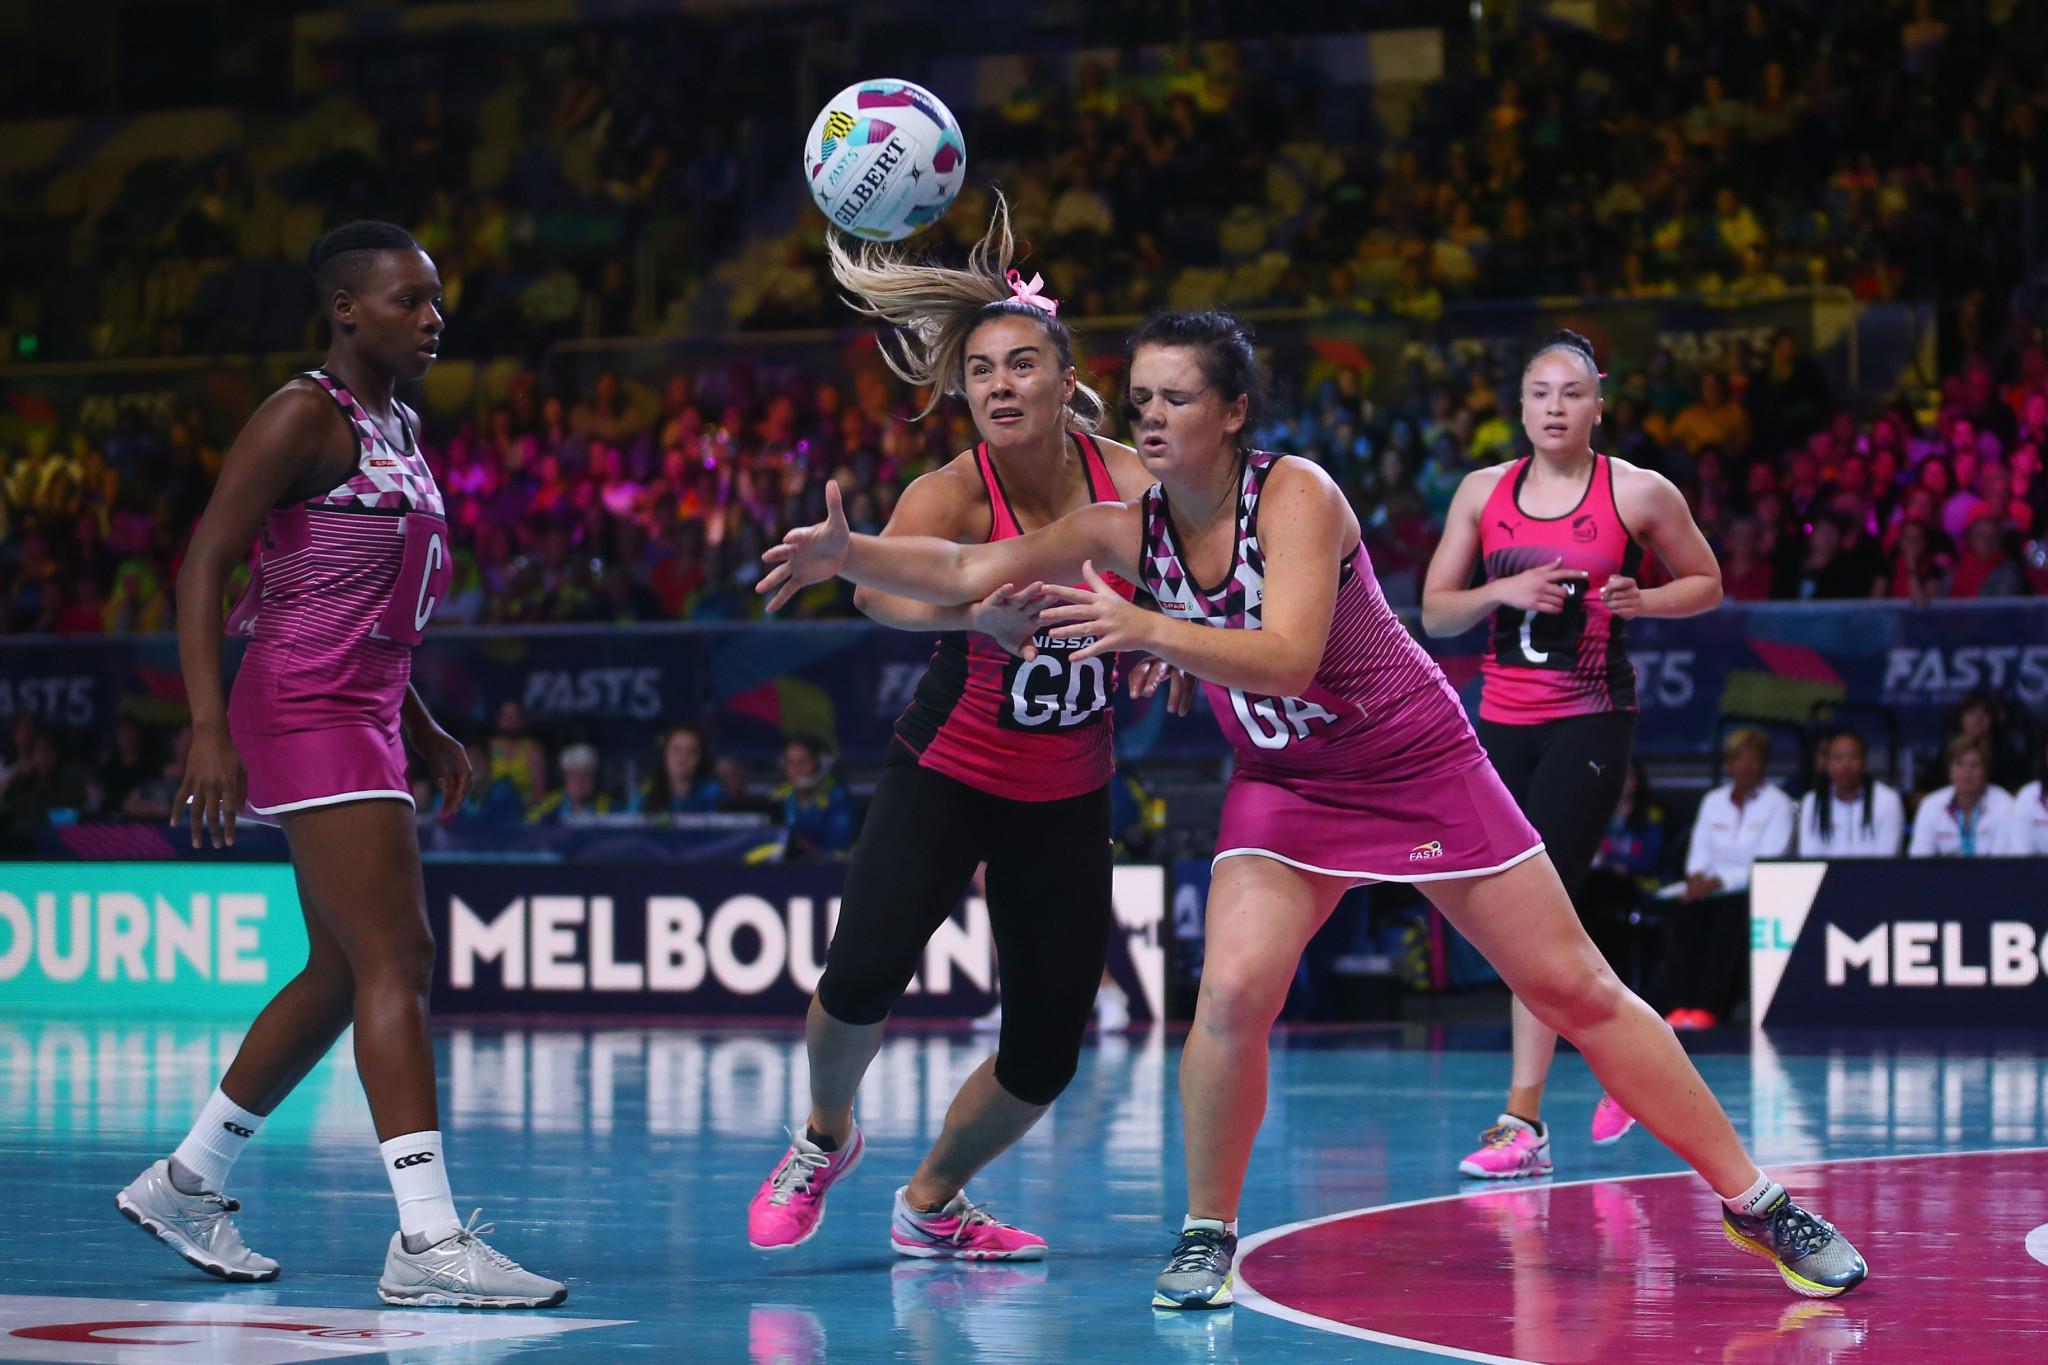 New Zealand unbeaten on first day of Fast5 Netball World Series